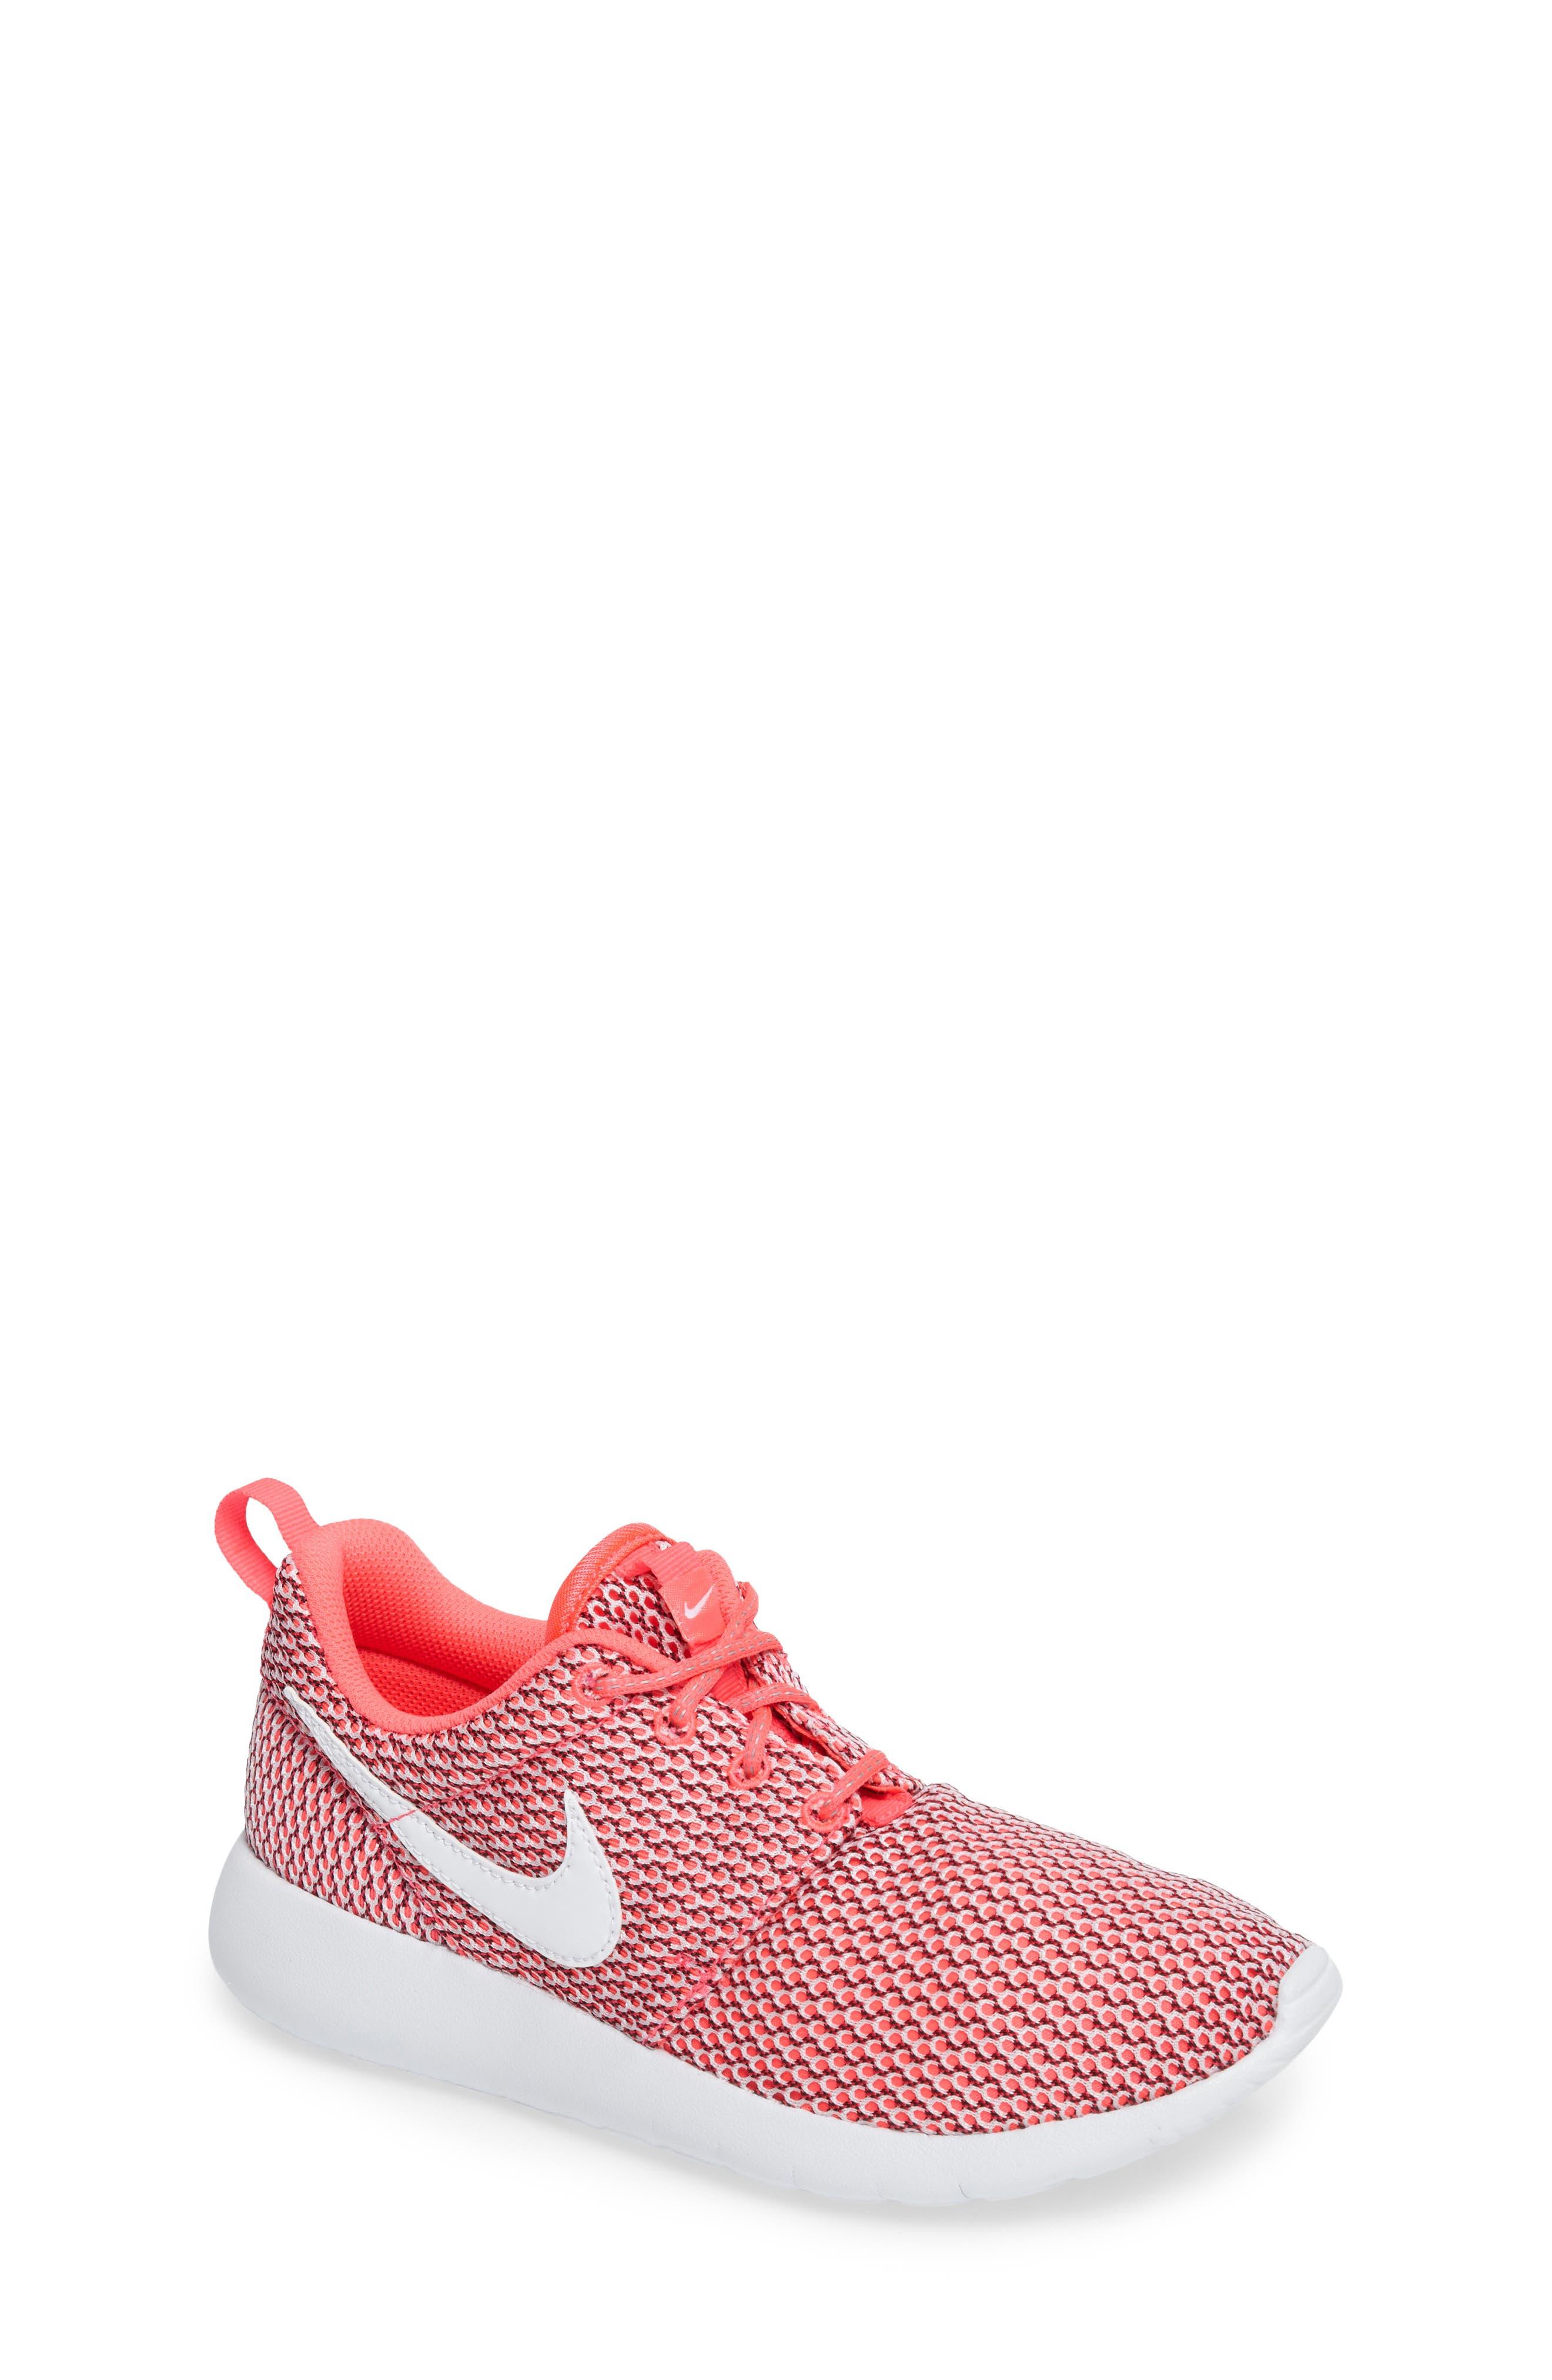 'Roshe Run' Athletic Shoe,                             Main thumbnail 49, color,